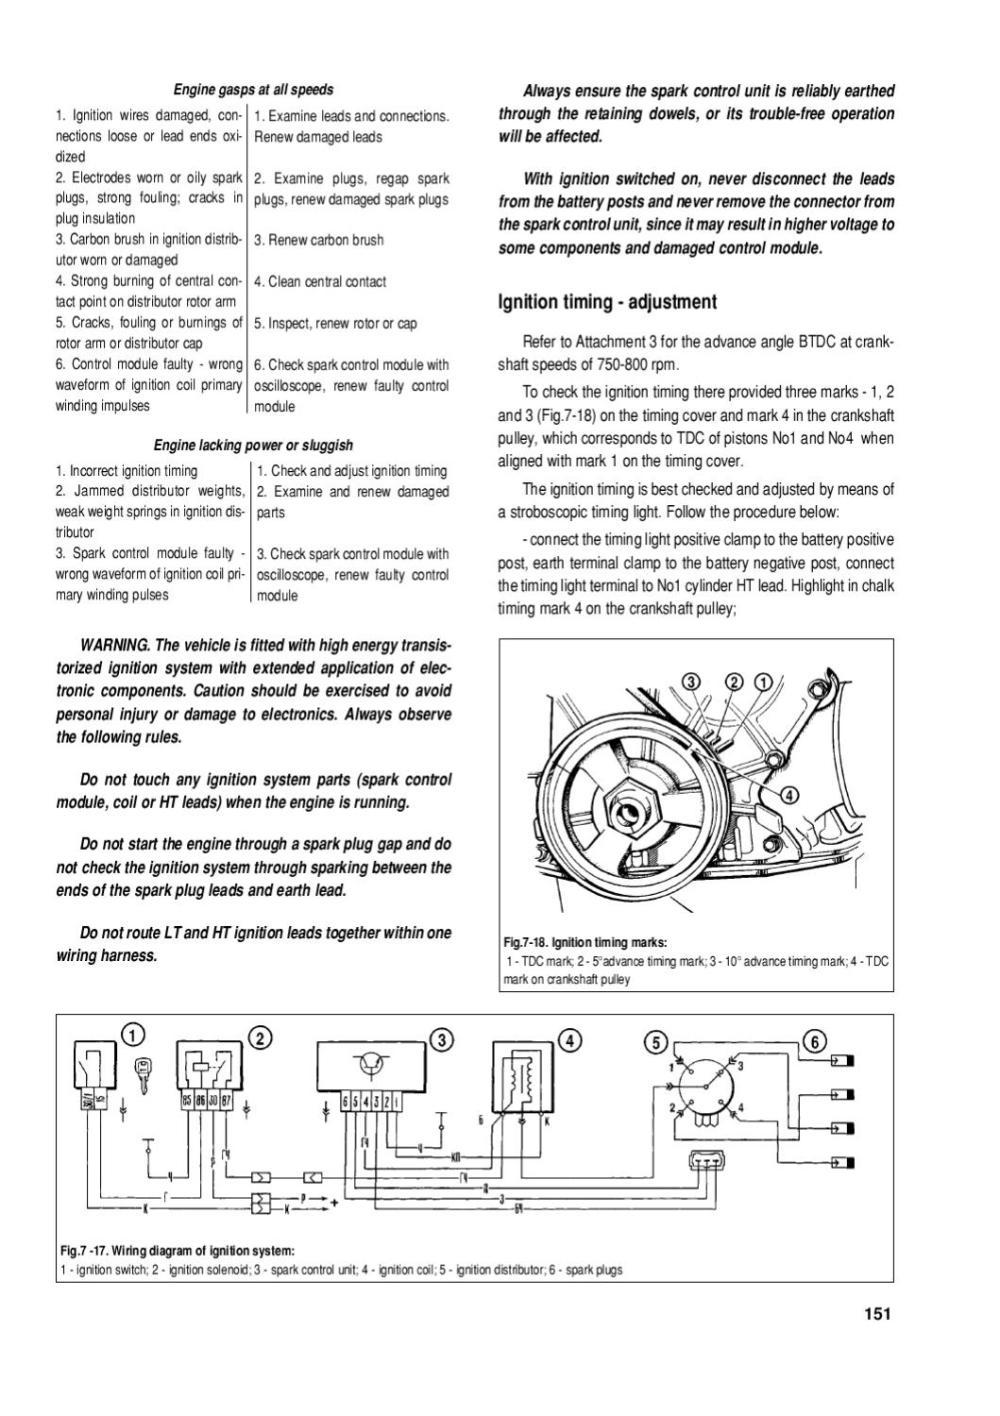 medium resolution of lada 4x4 niva 1700 repair manual part 3